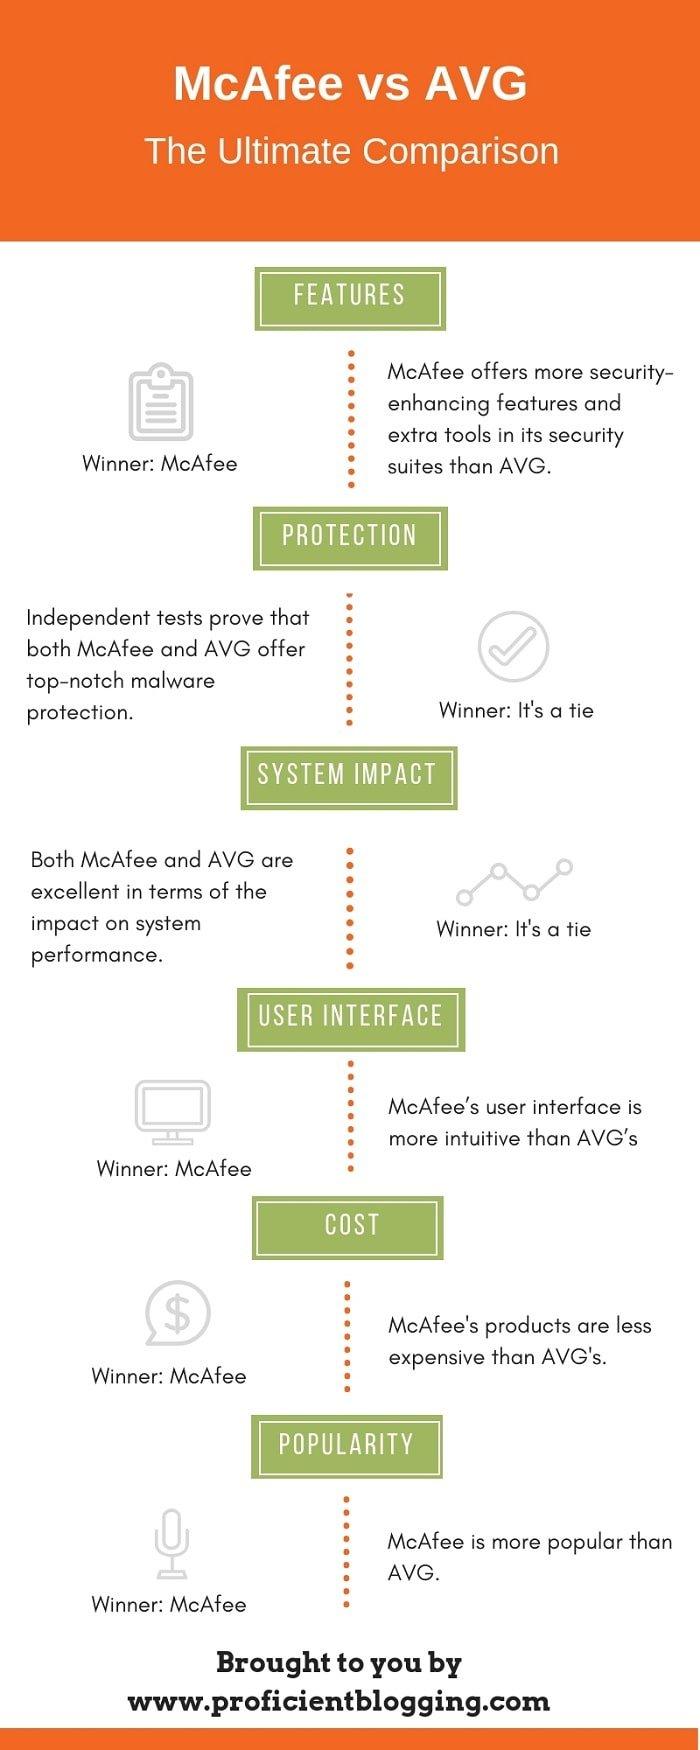 McAfee Vs AVG | Comprehensive & Unbiased Comparison (2019)